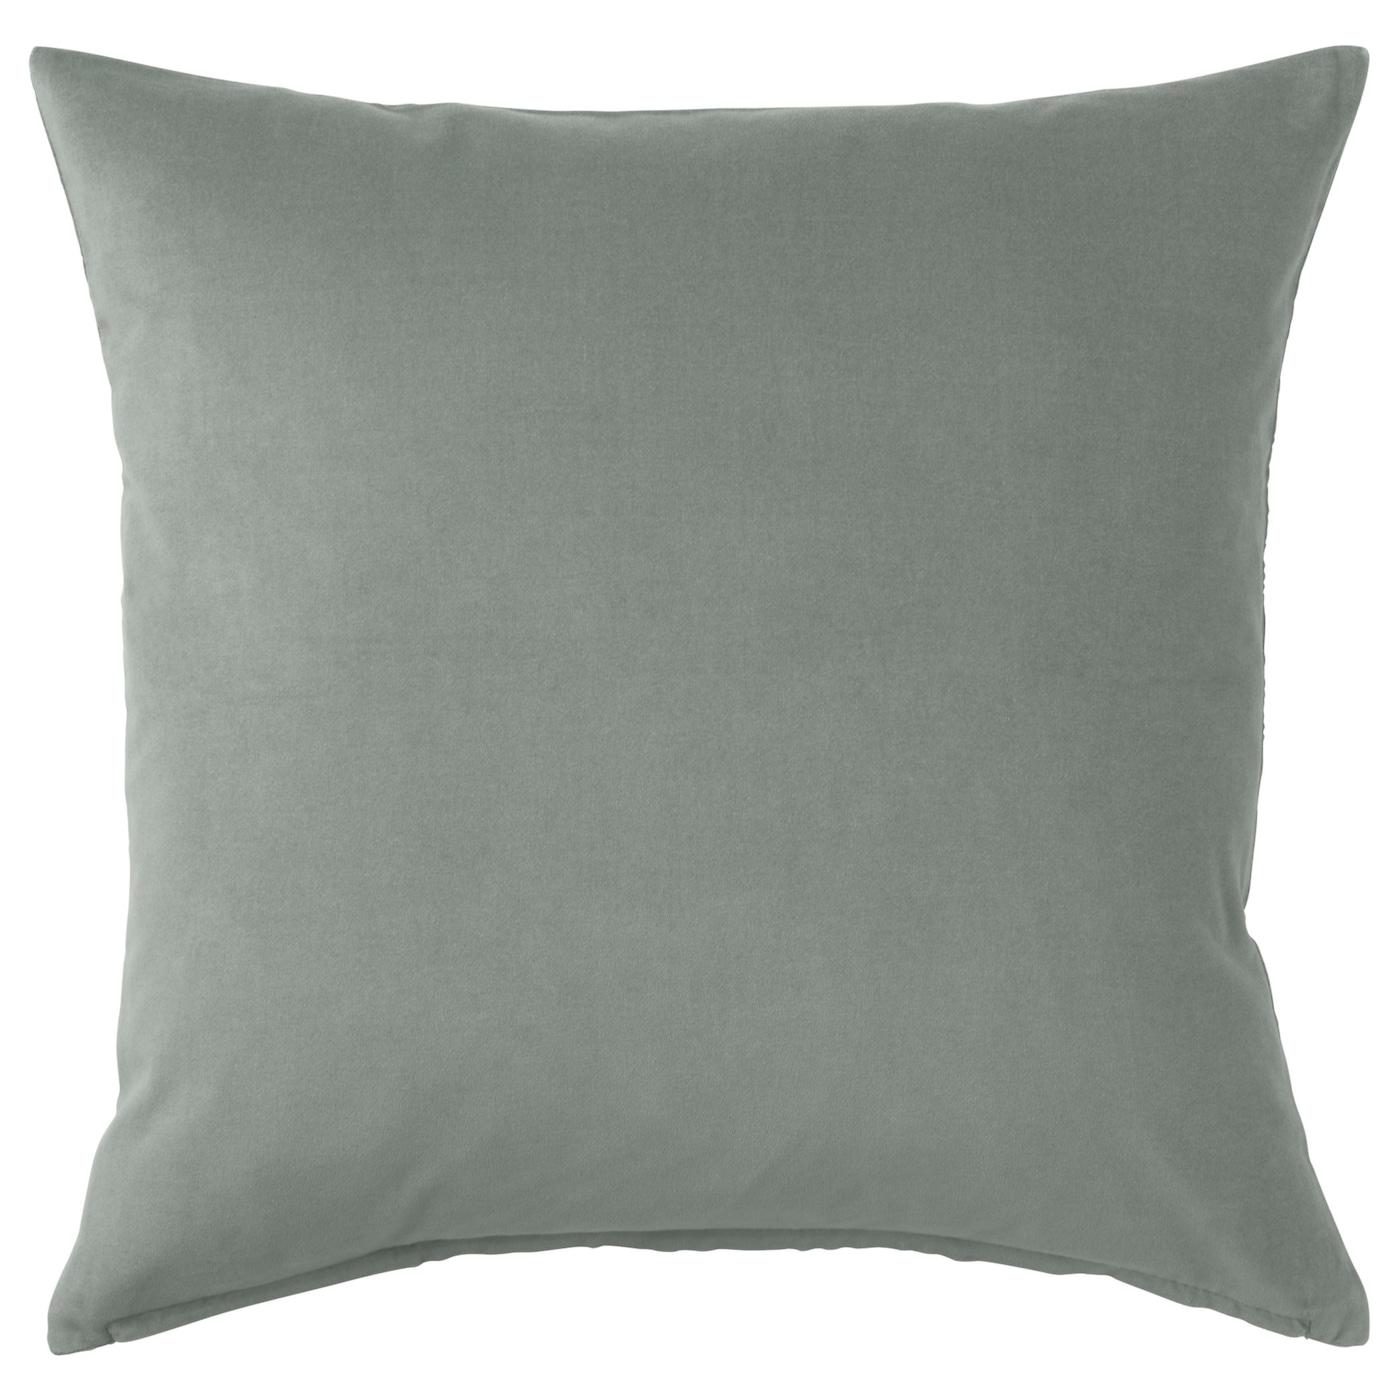 stenlille tapis poils ras vert 170 x 240 cm ikea. Black Bedroom Furniture Sets. Home Design Ideas